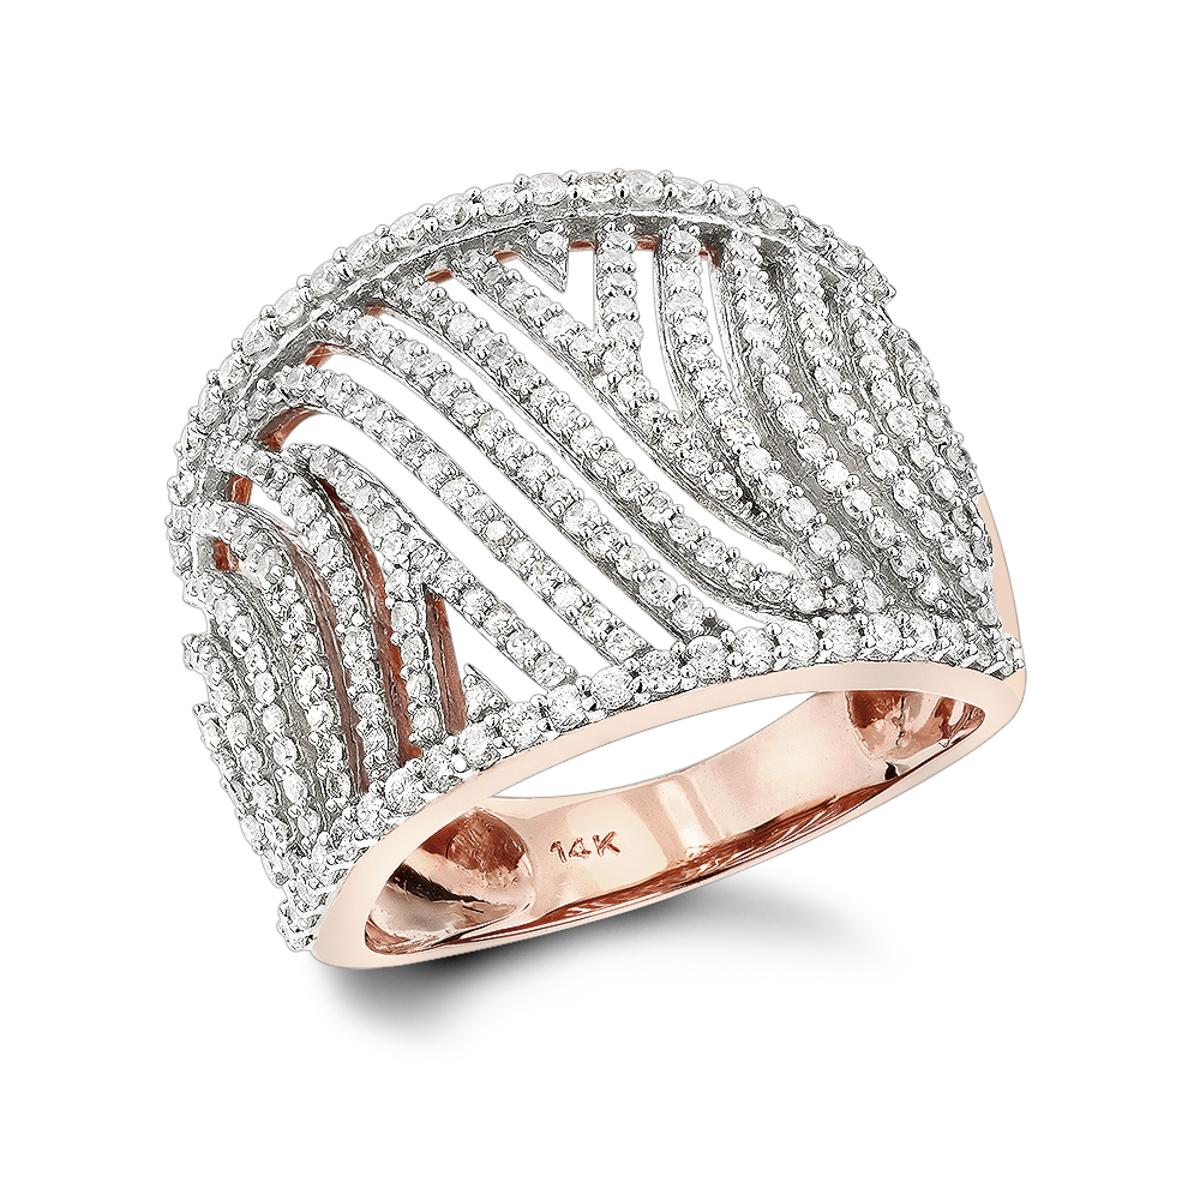 Unique Diamond Rings: 14K Cut-Out Diamond Ring 1ct